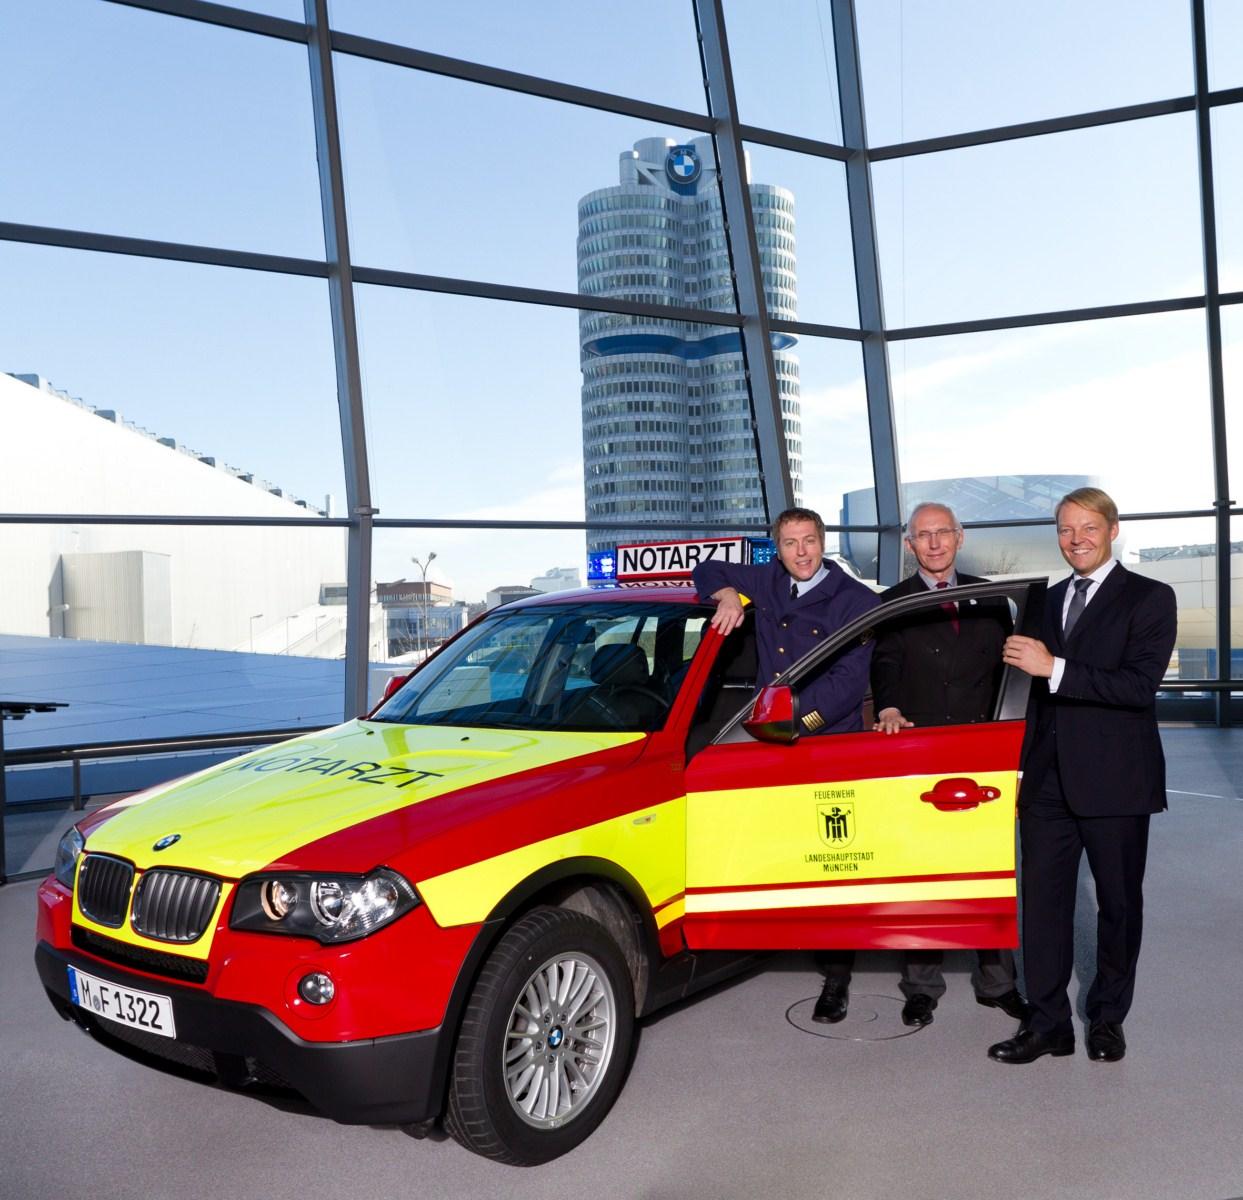 BMW X3 E83 Notarzt Muenchen 01